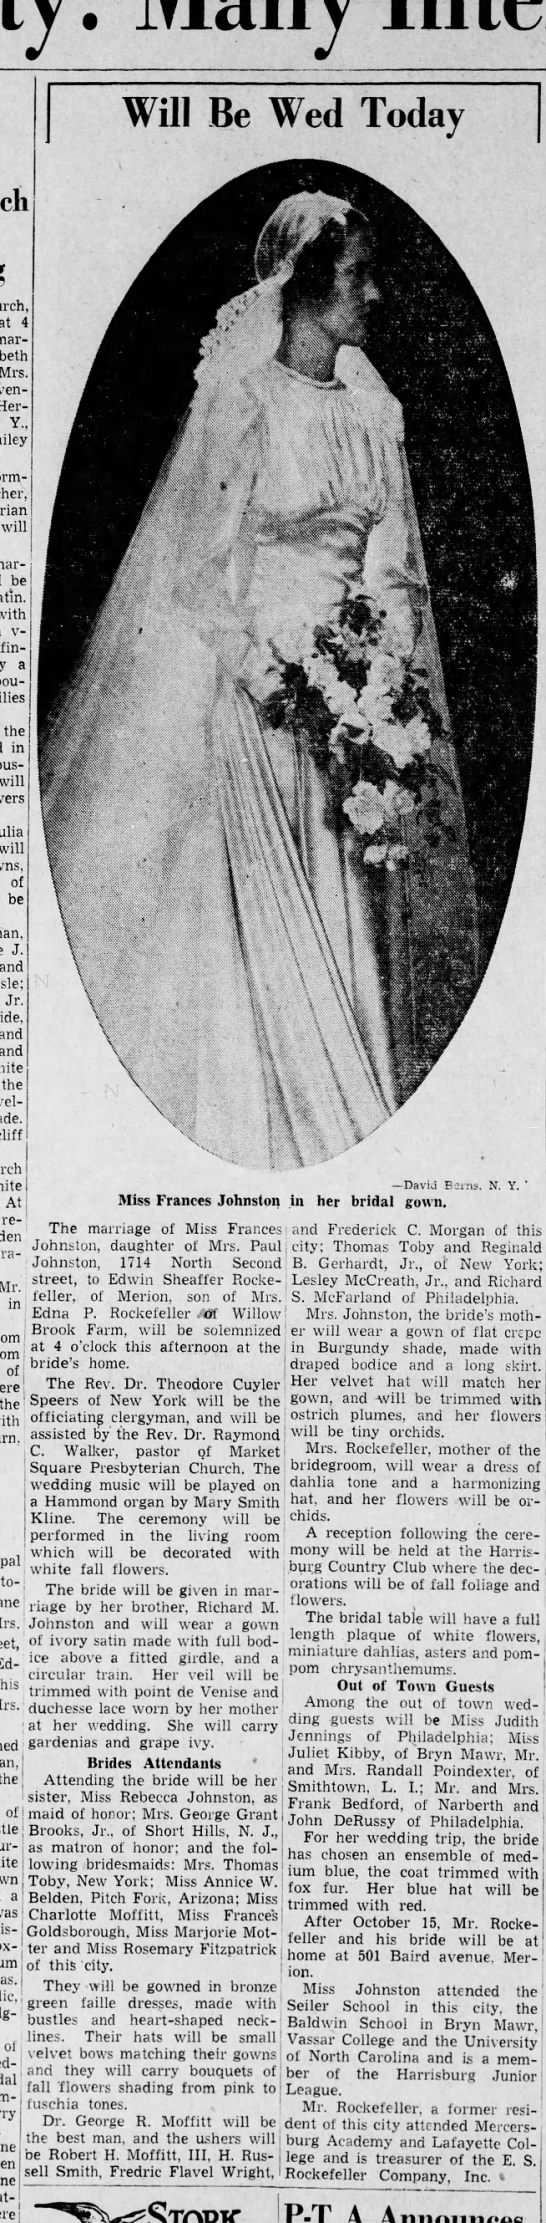 es rockefeller & Frances Johnston wedding Harrisburg Telegraph 9/23/1939 -